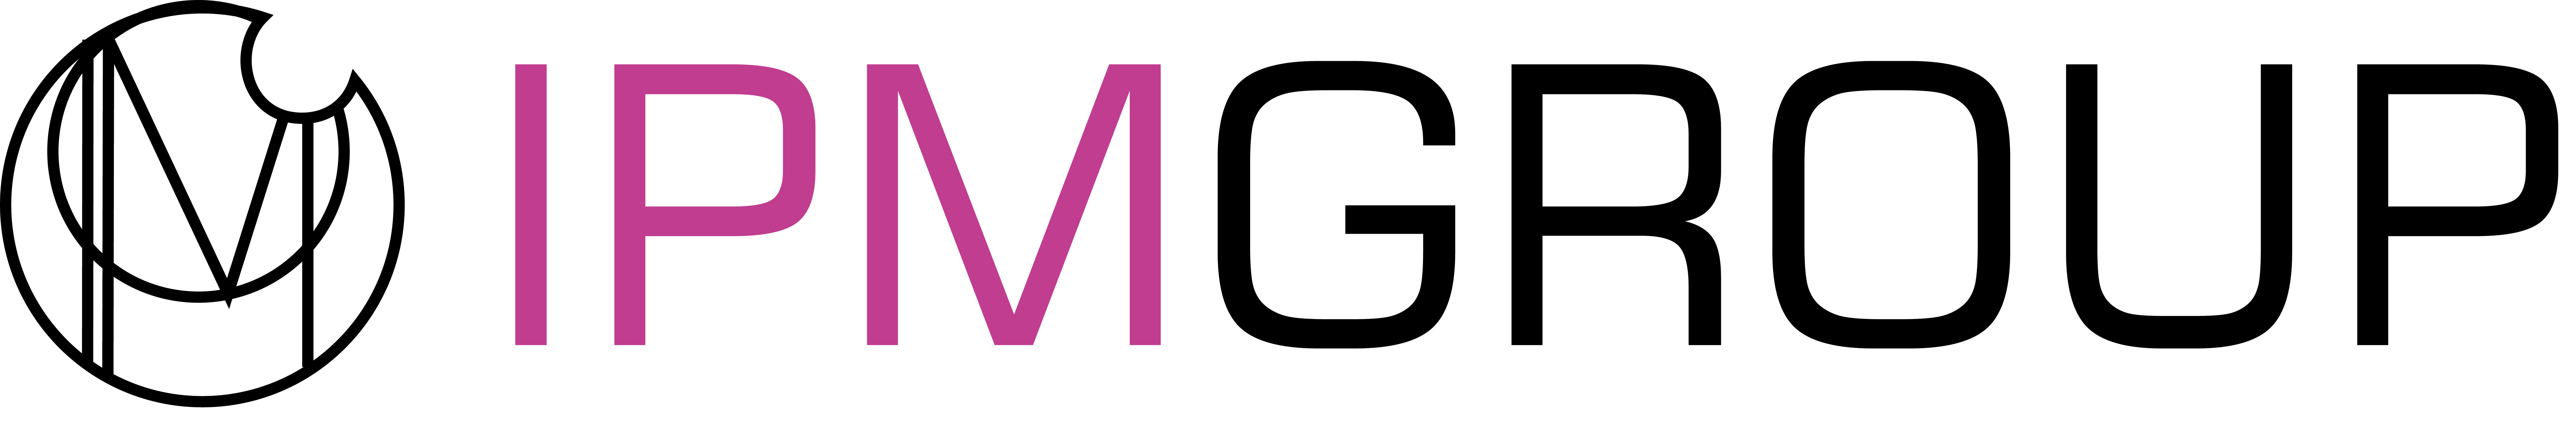 Разработка логотипа для управляющей компании фото f_2545f830a3213586.jpg